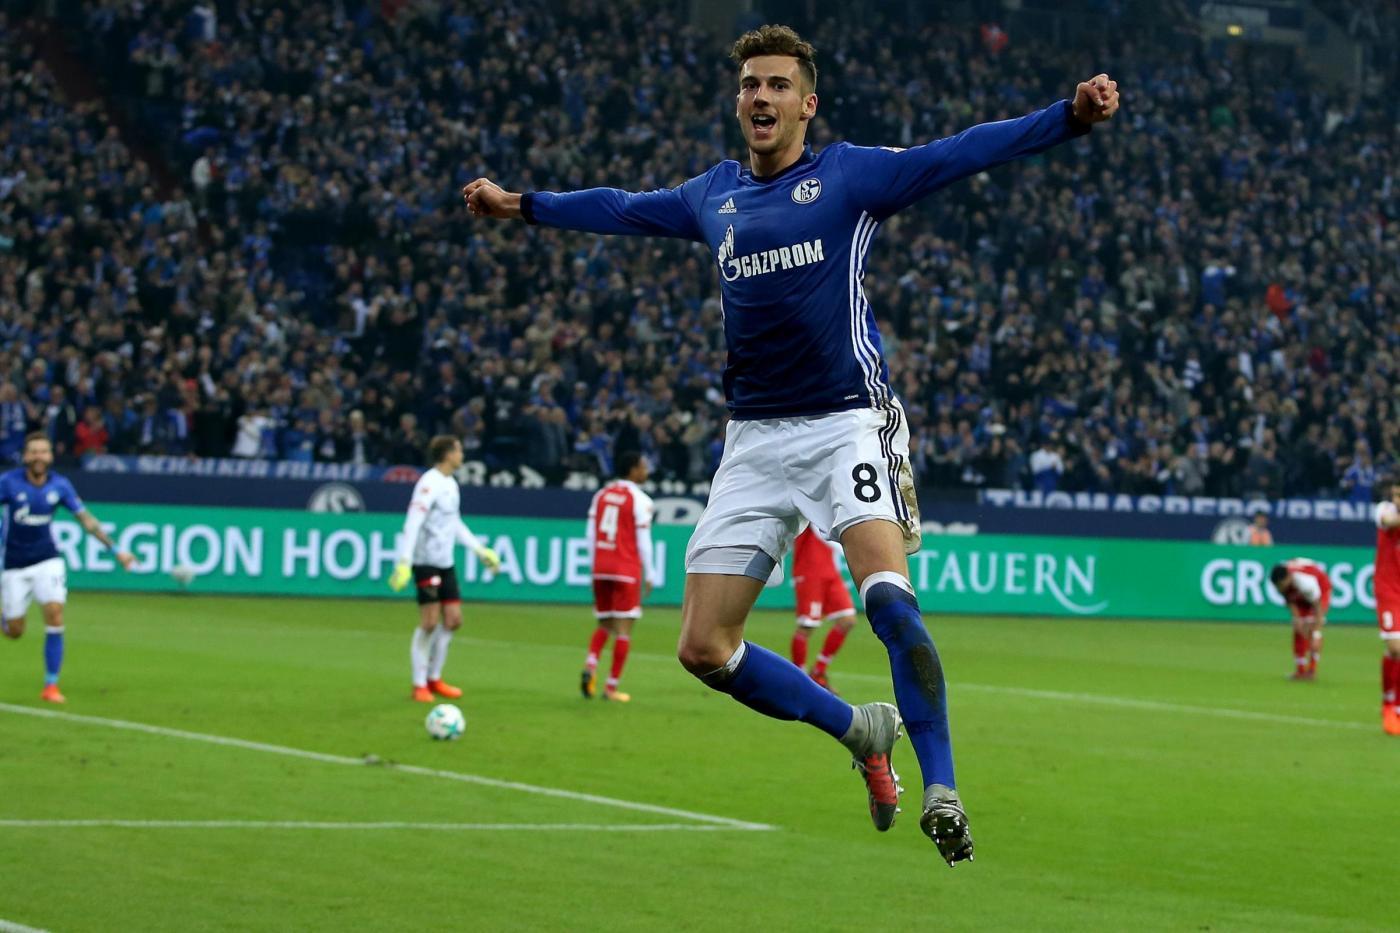 UFFICIALE: Goretzka al Bayern!